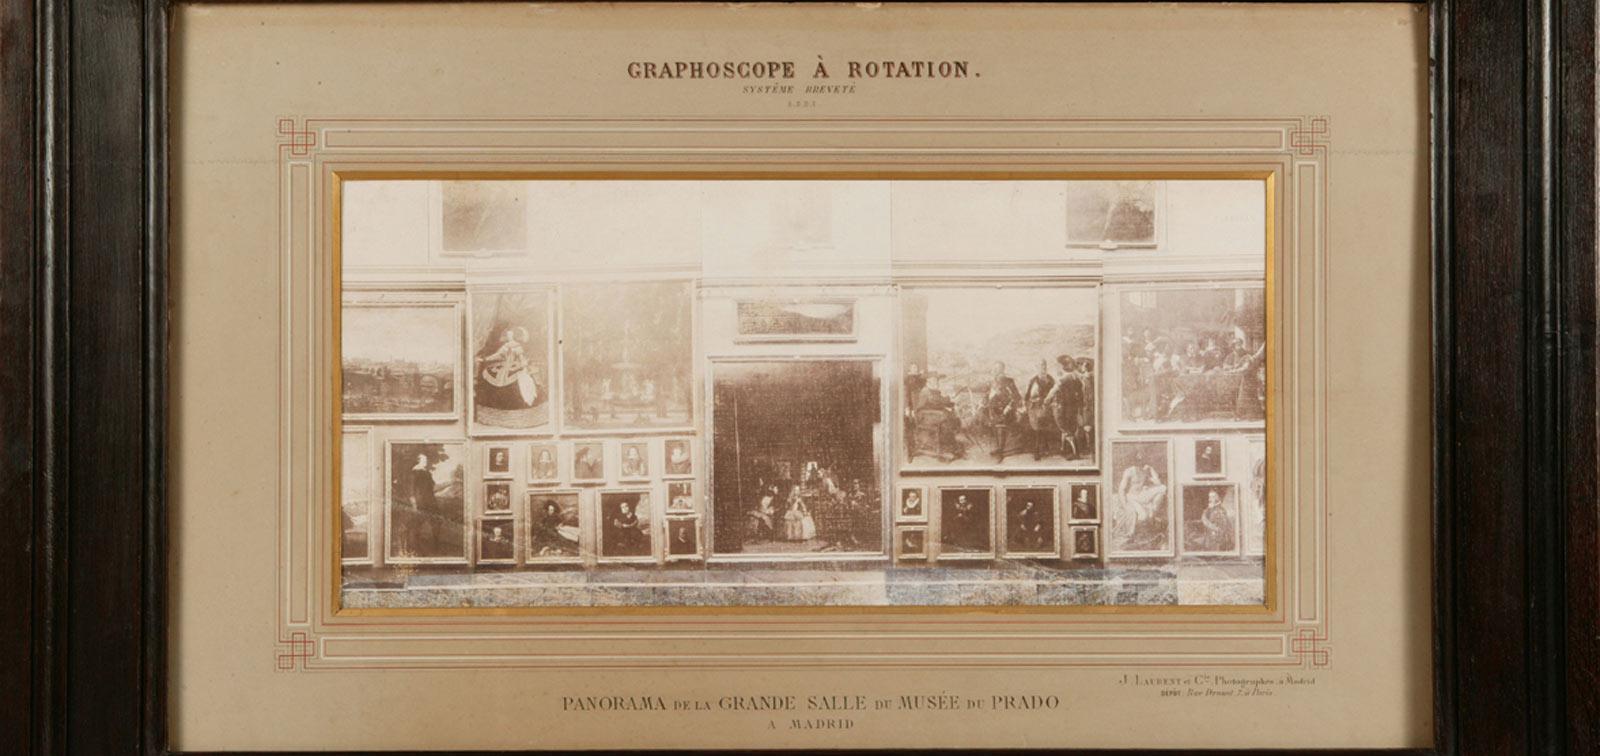 The Graphoscope